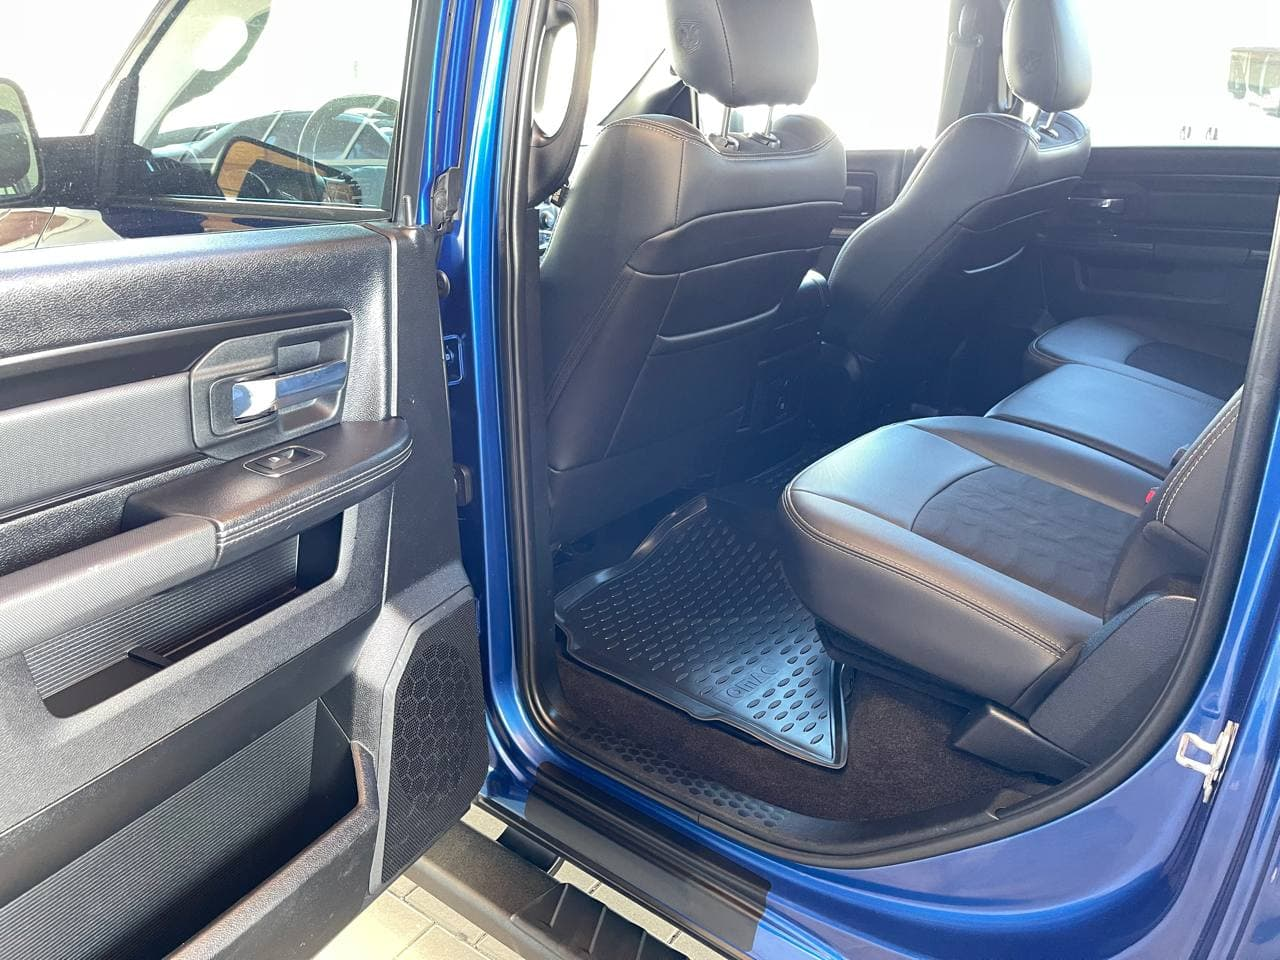 2017 Dodge Ram 1500 Rebel American Pickup zu verkaufen